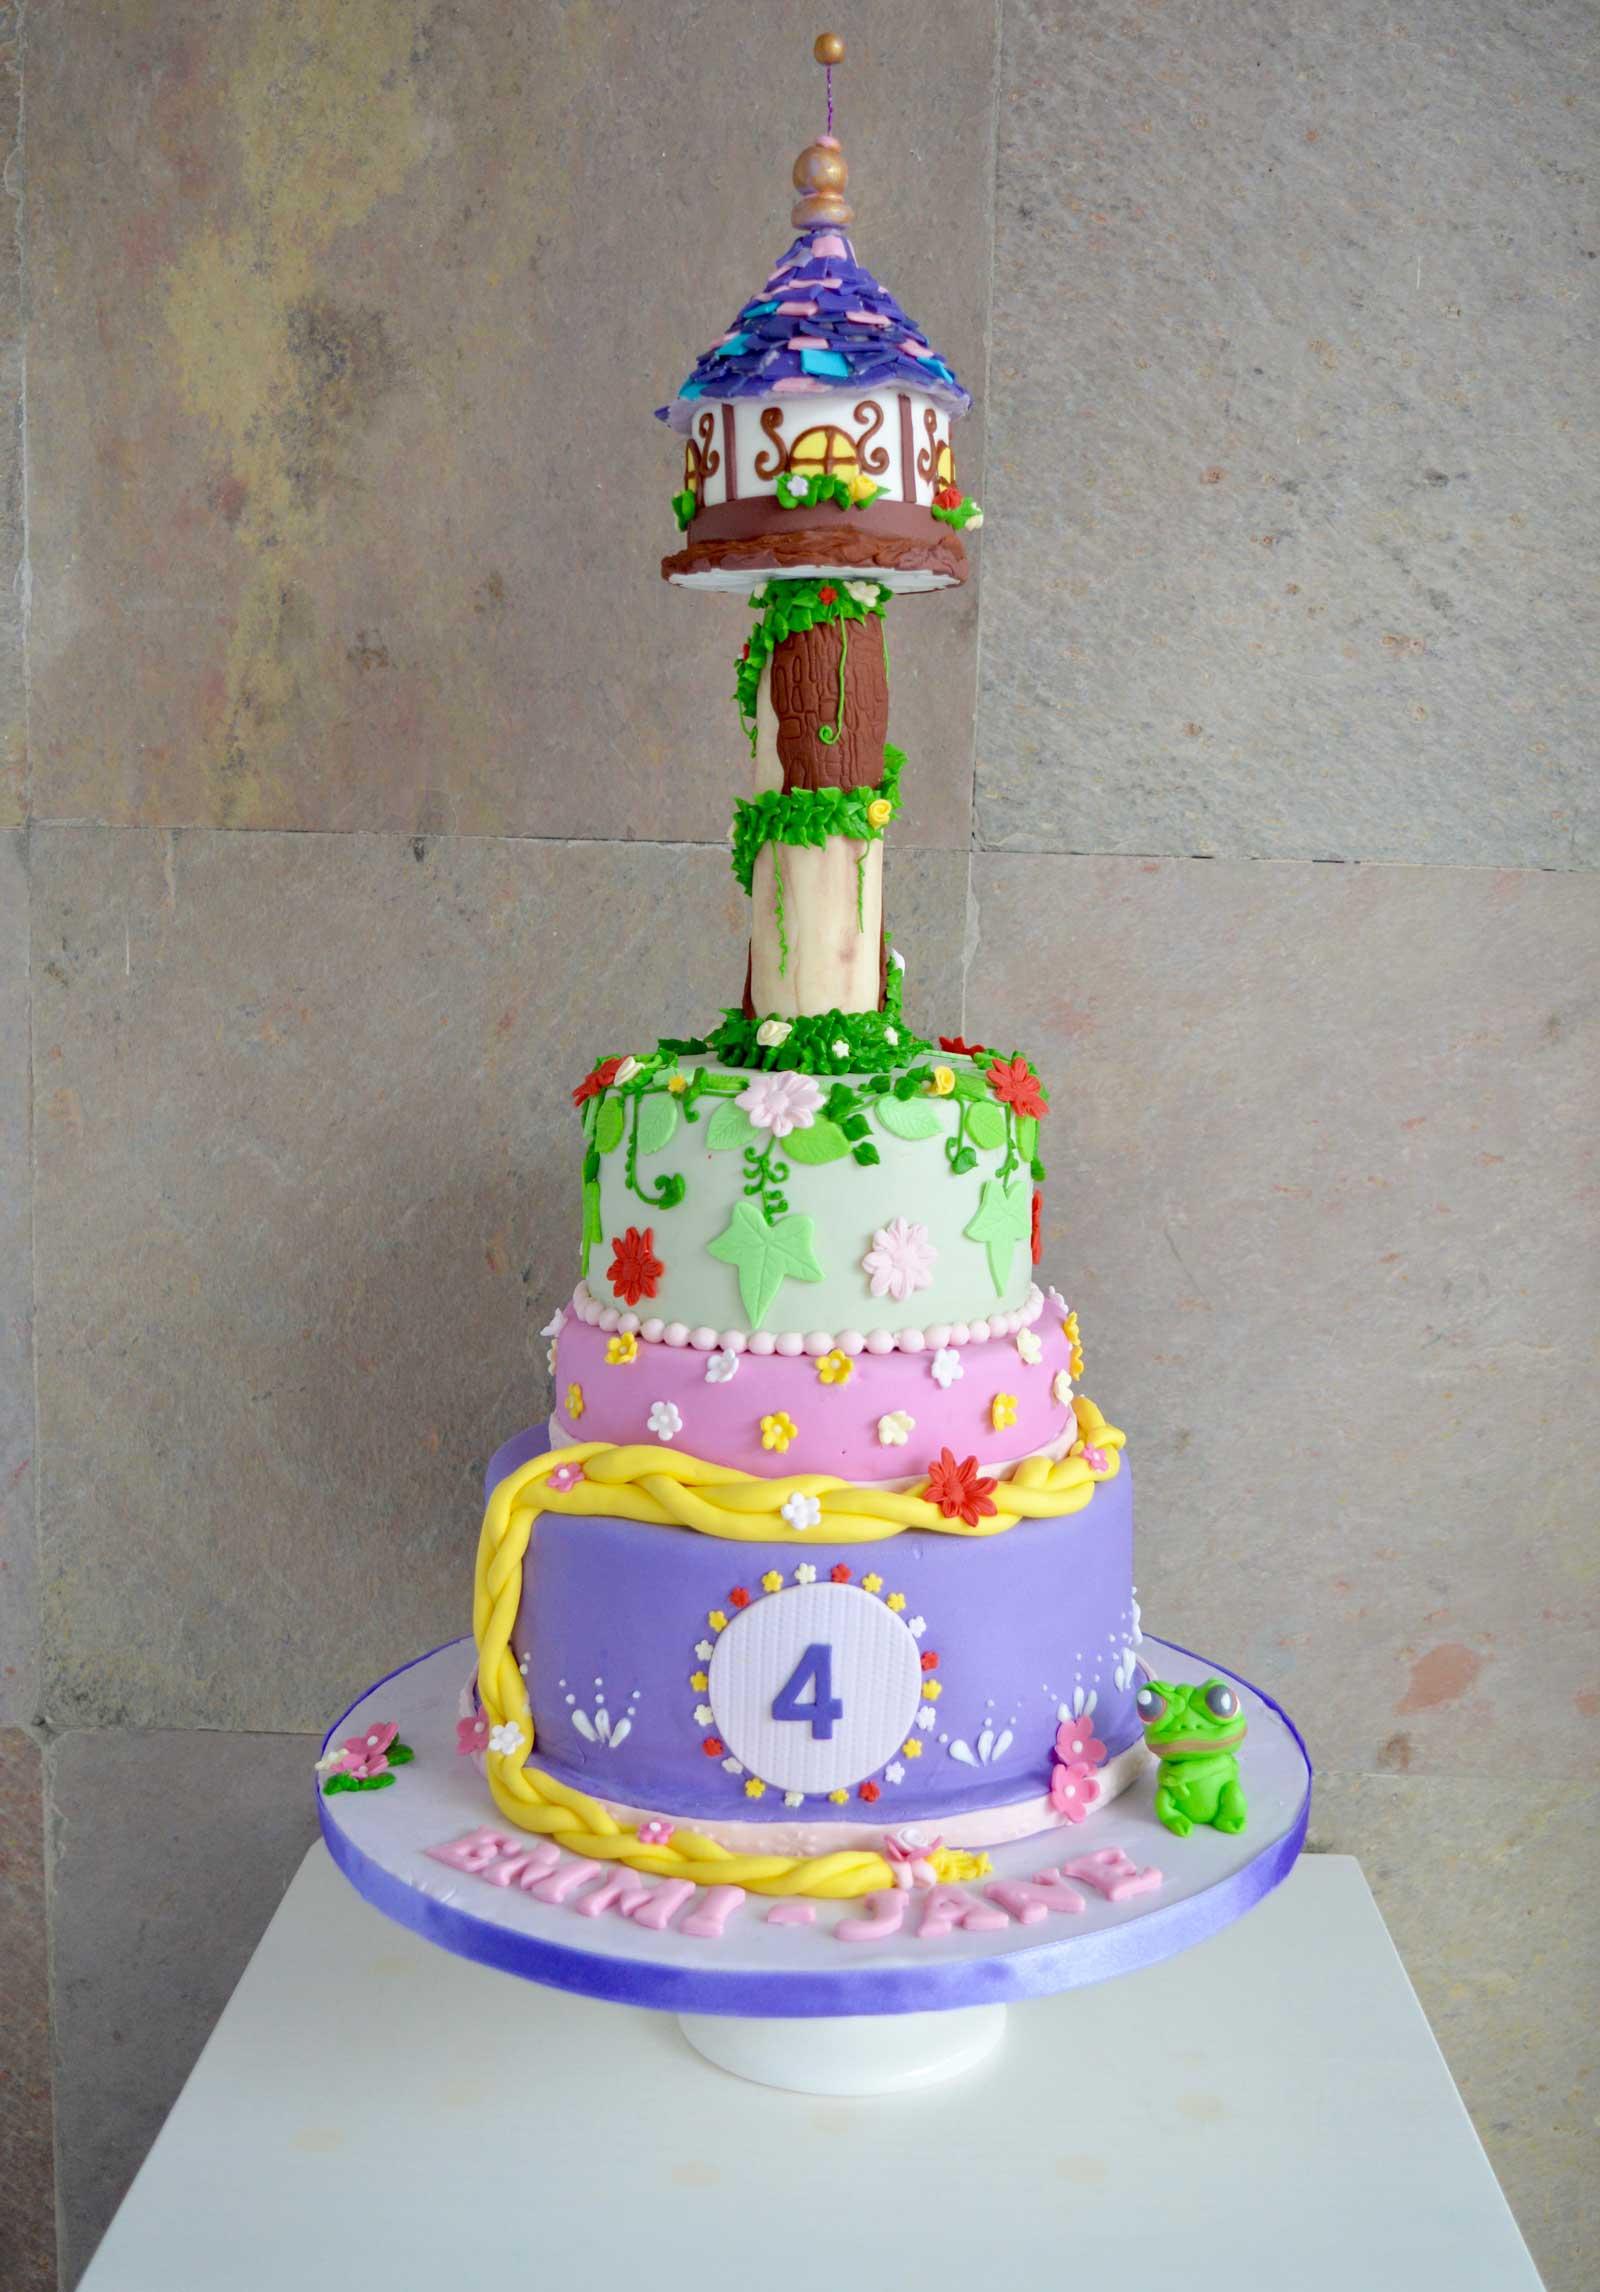 Rapunzel taart, Rapunzel Disney kastel taart, Rapunzel cake,